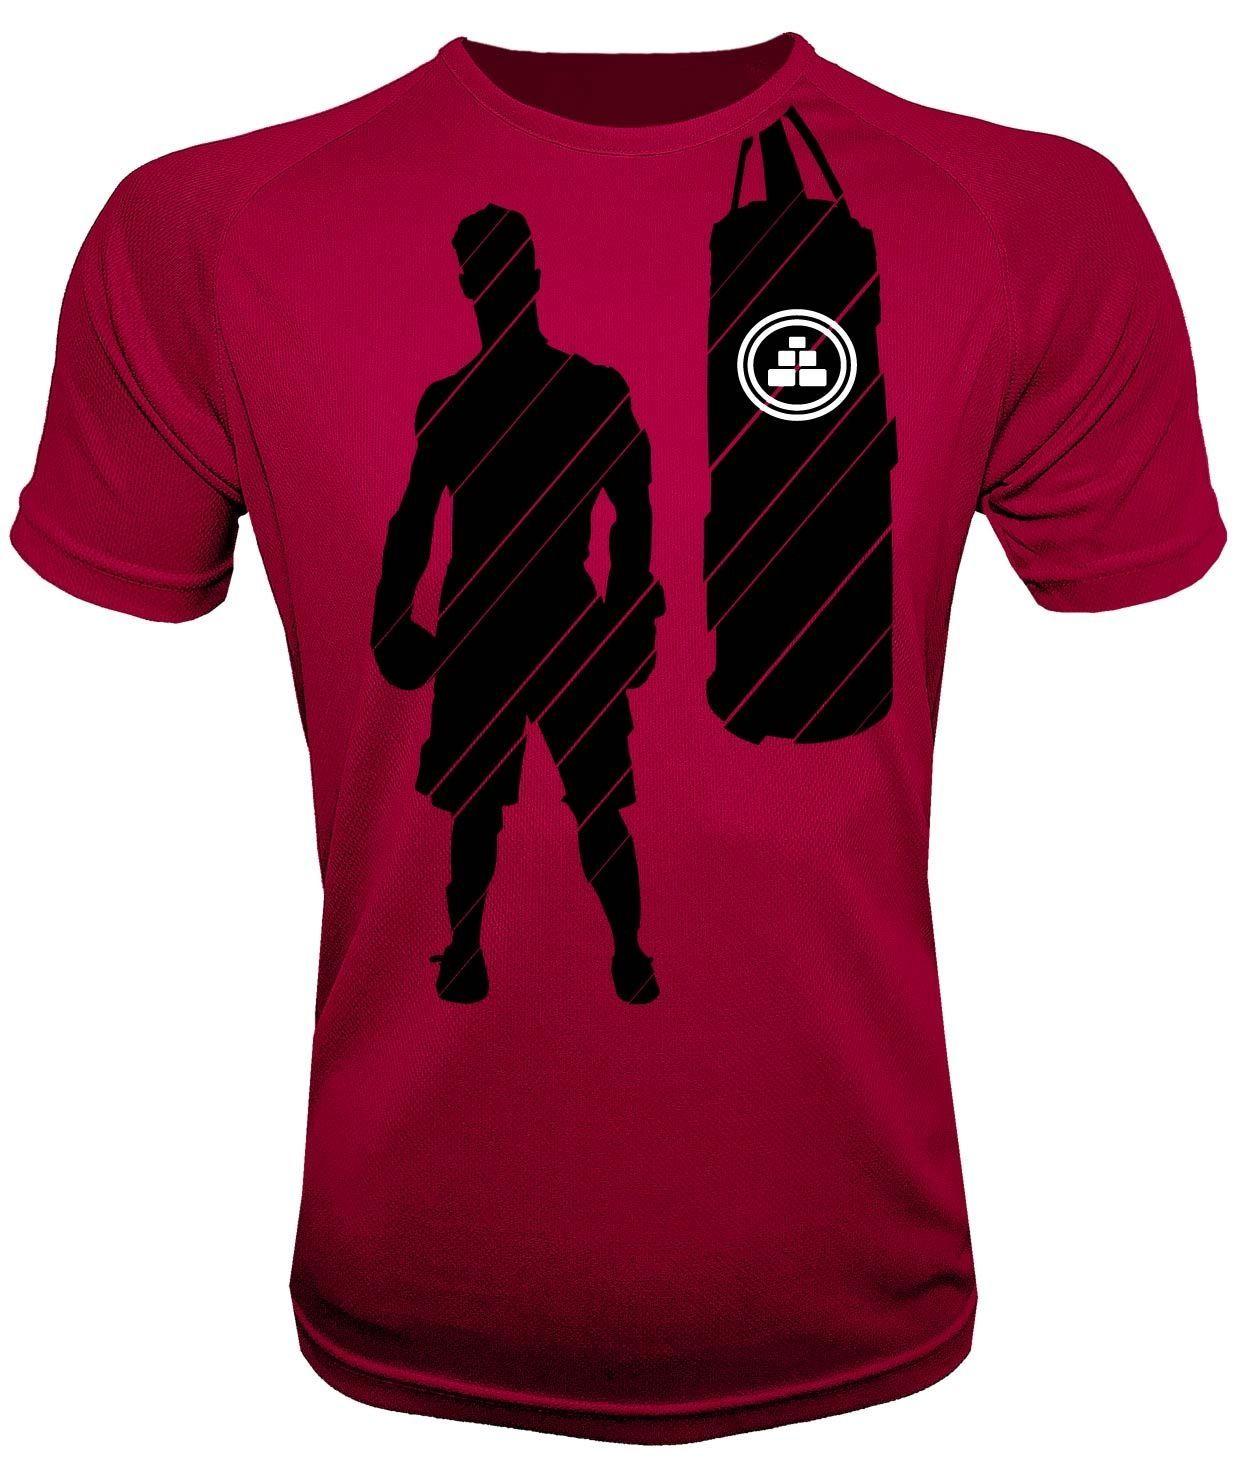 Camiseta de deporte boxeo roja